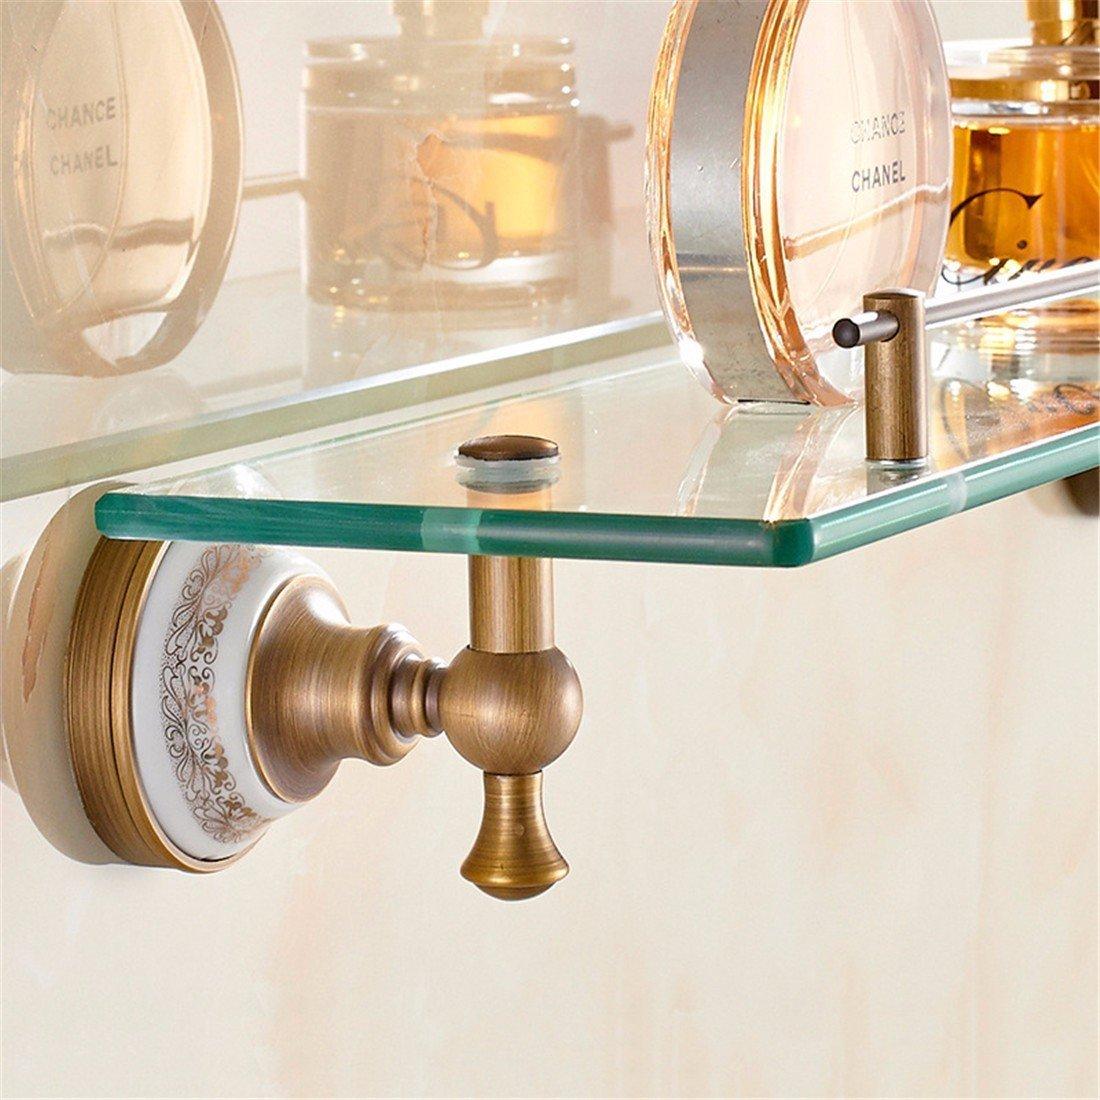 LAONA European style all copper antique drawing ceramic base, bathroom pendant set, toilet paper rack, towel rod,Rack 1